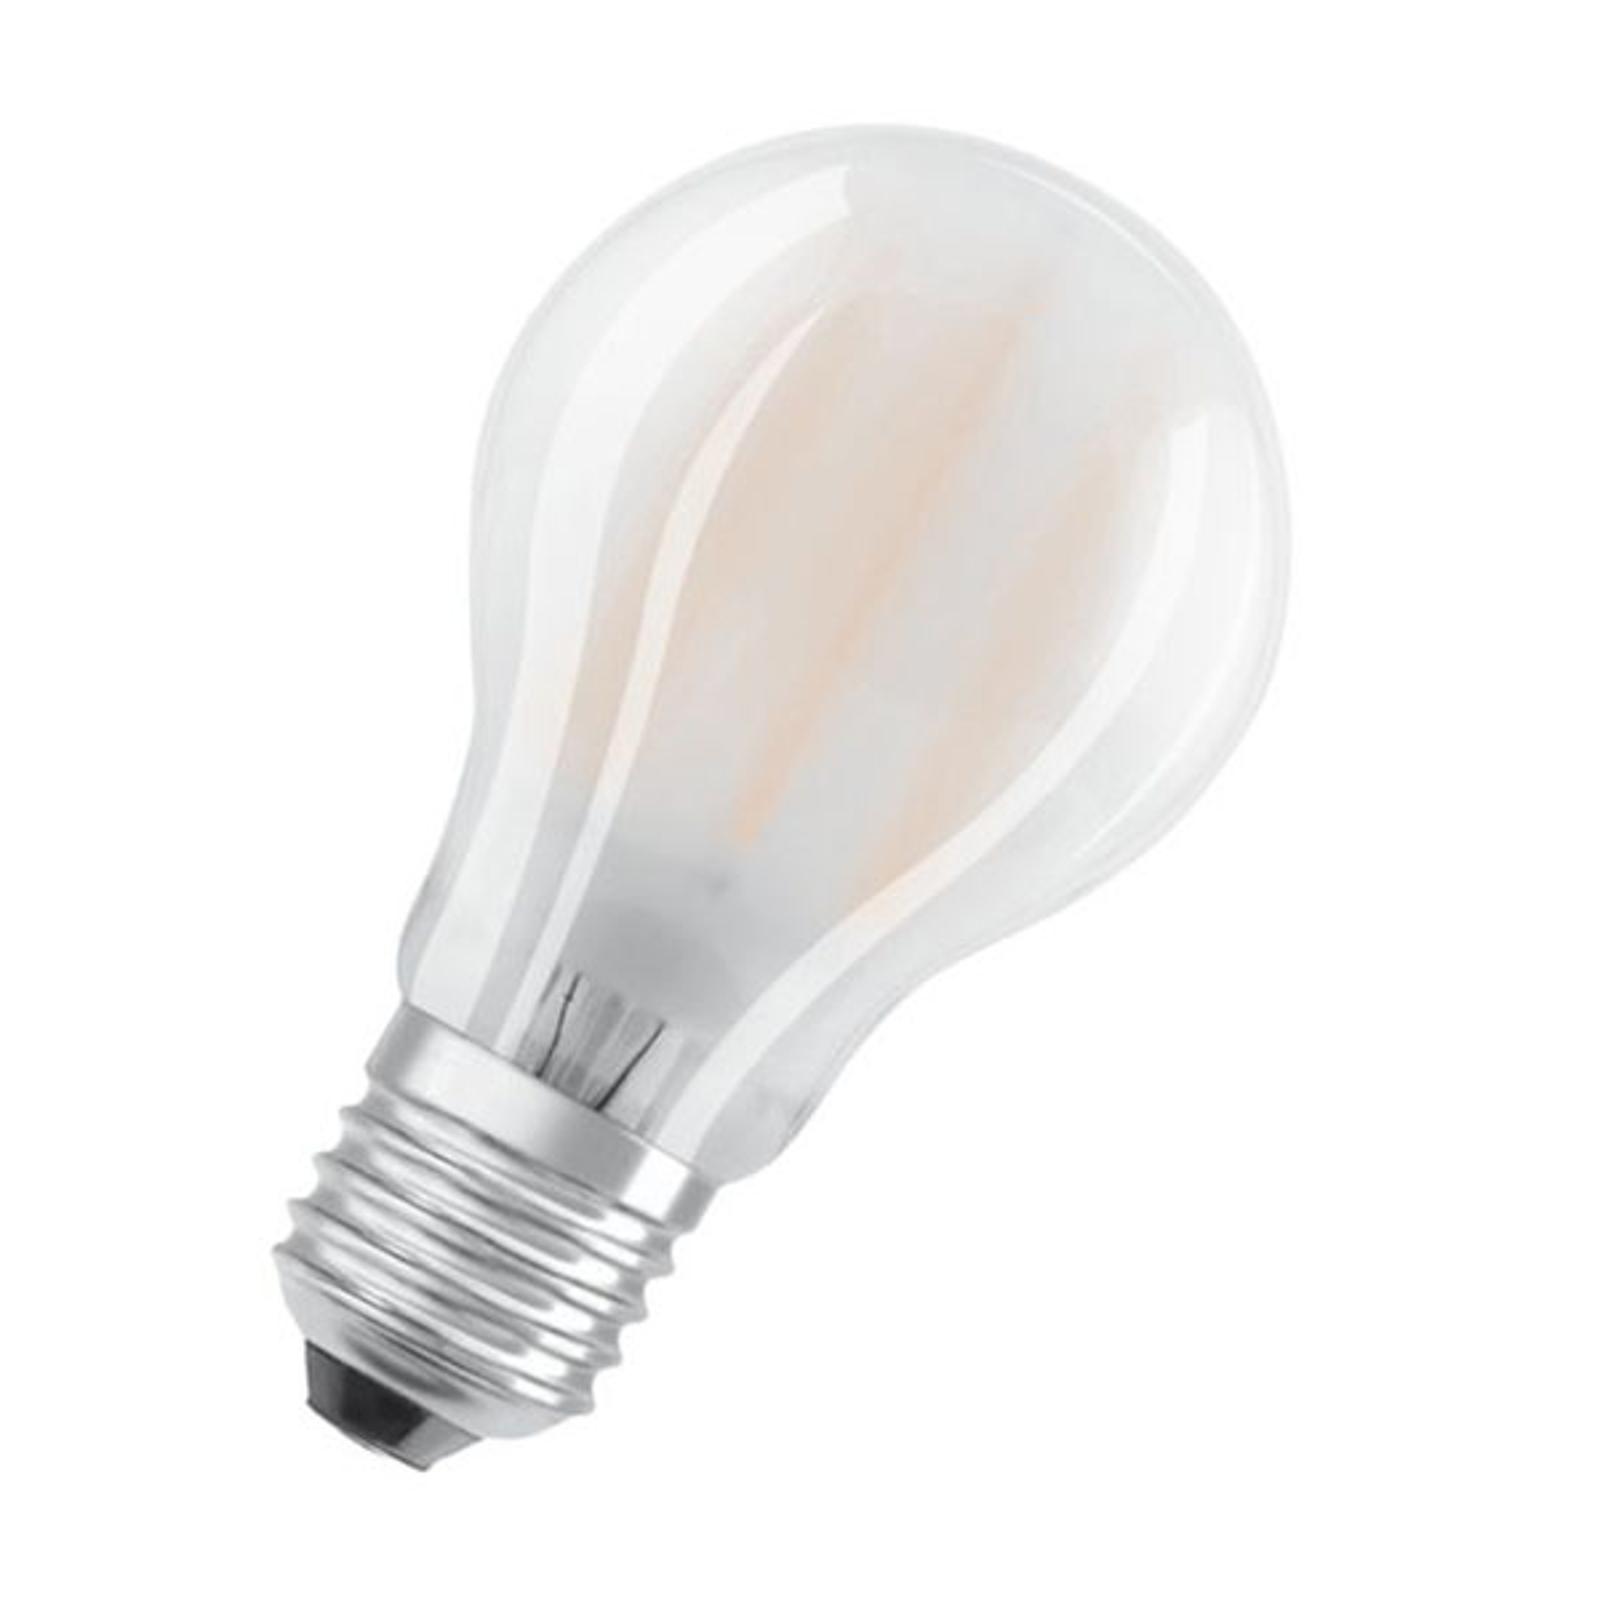 OSRAM Classic A LED-Lampe E27 2,5W 2.700K matt